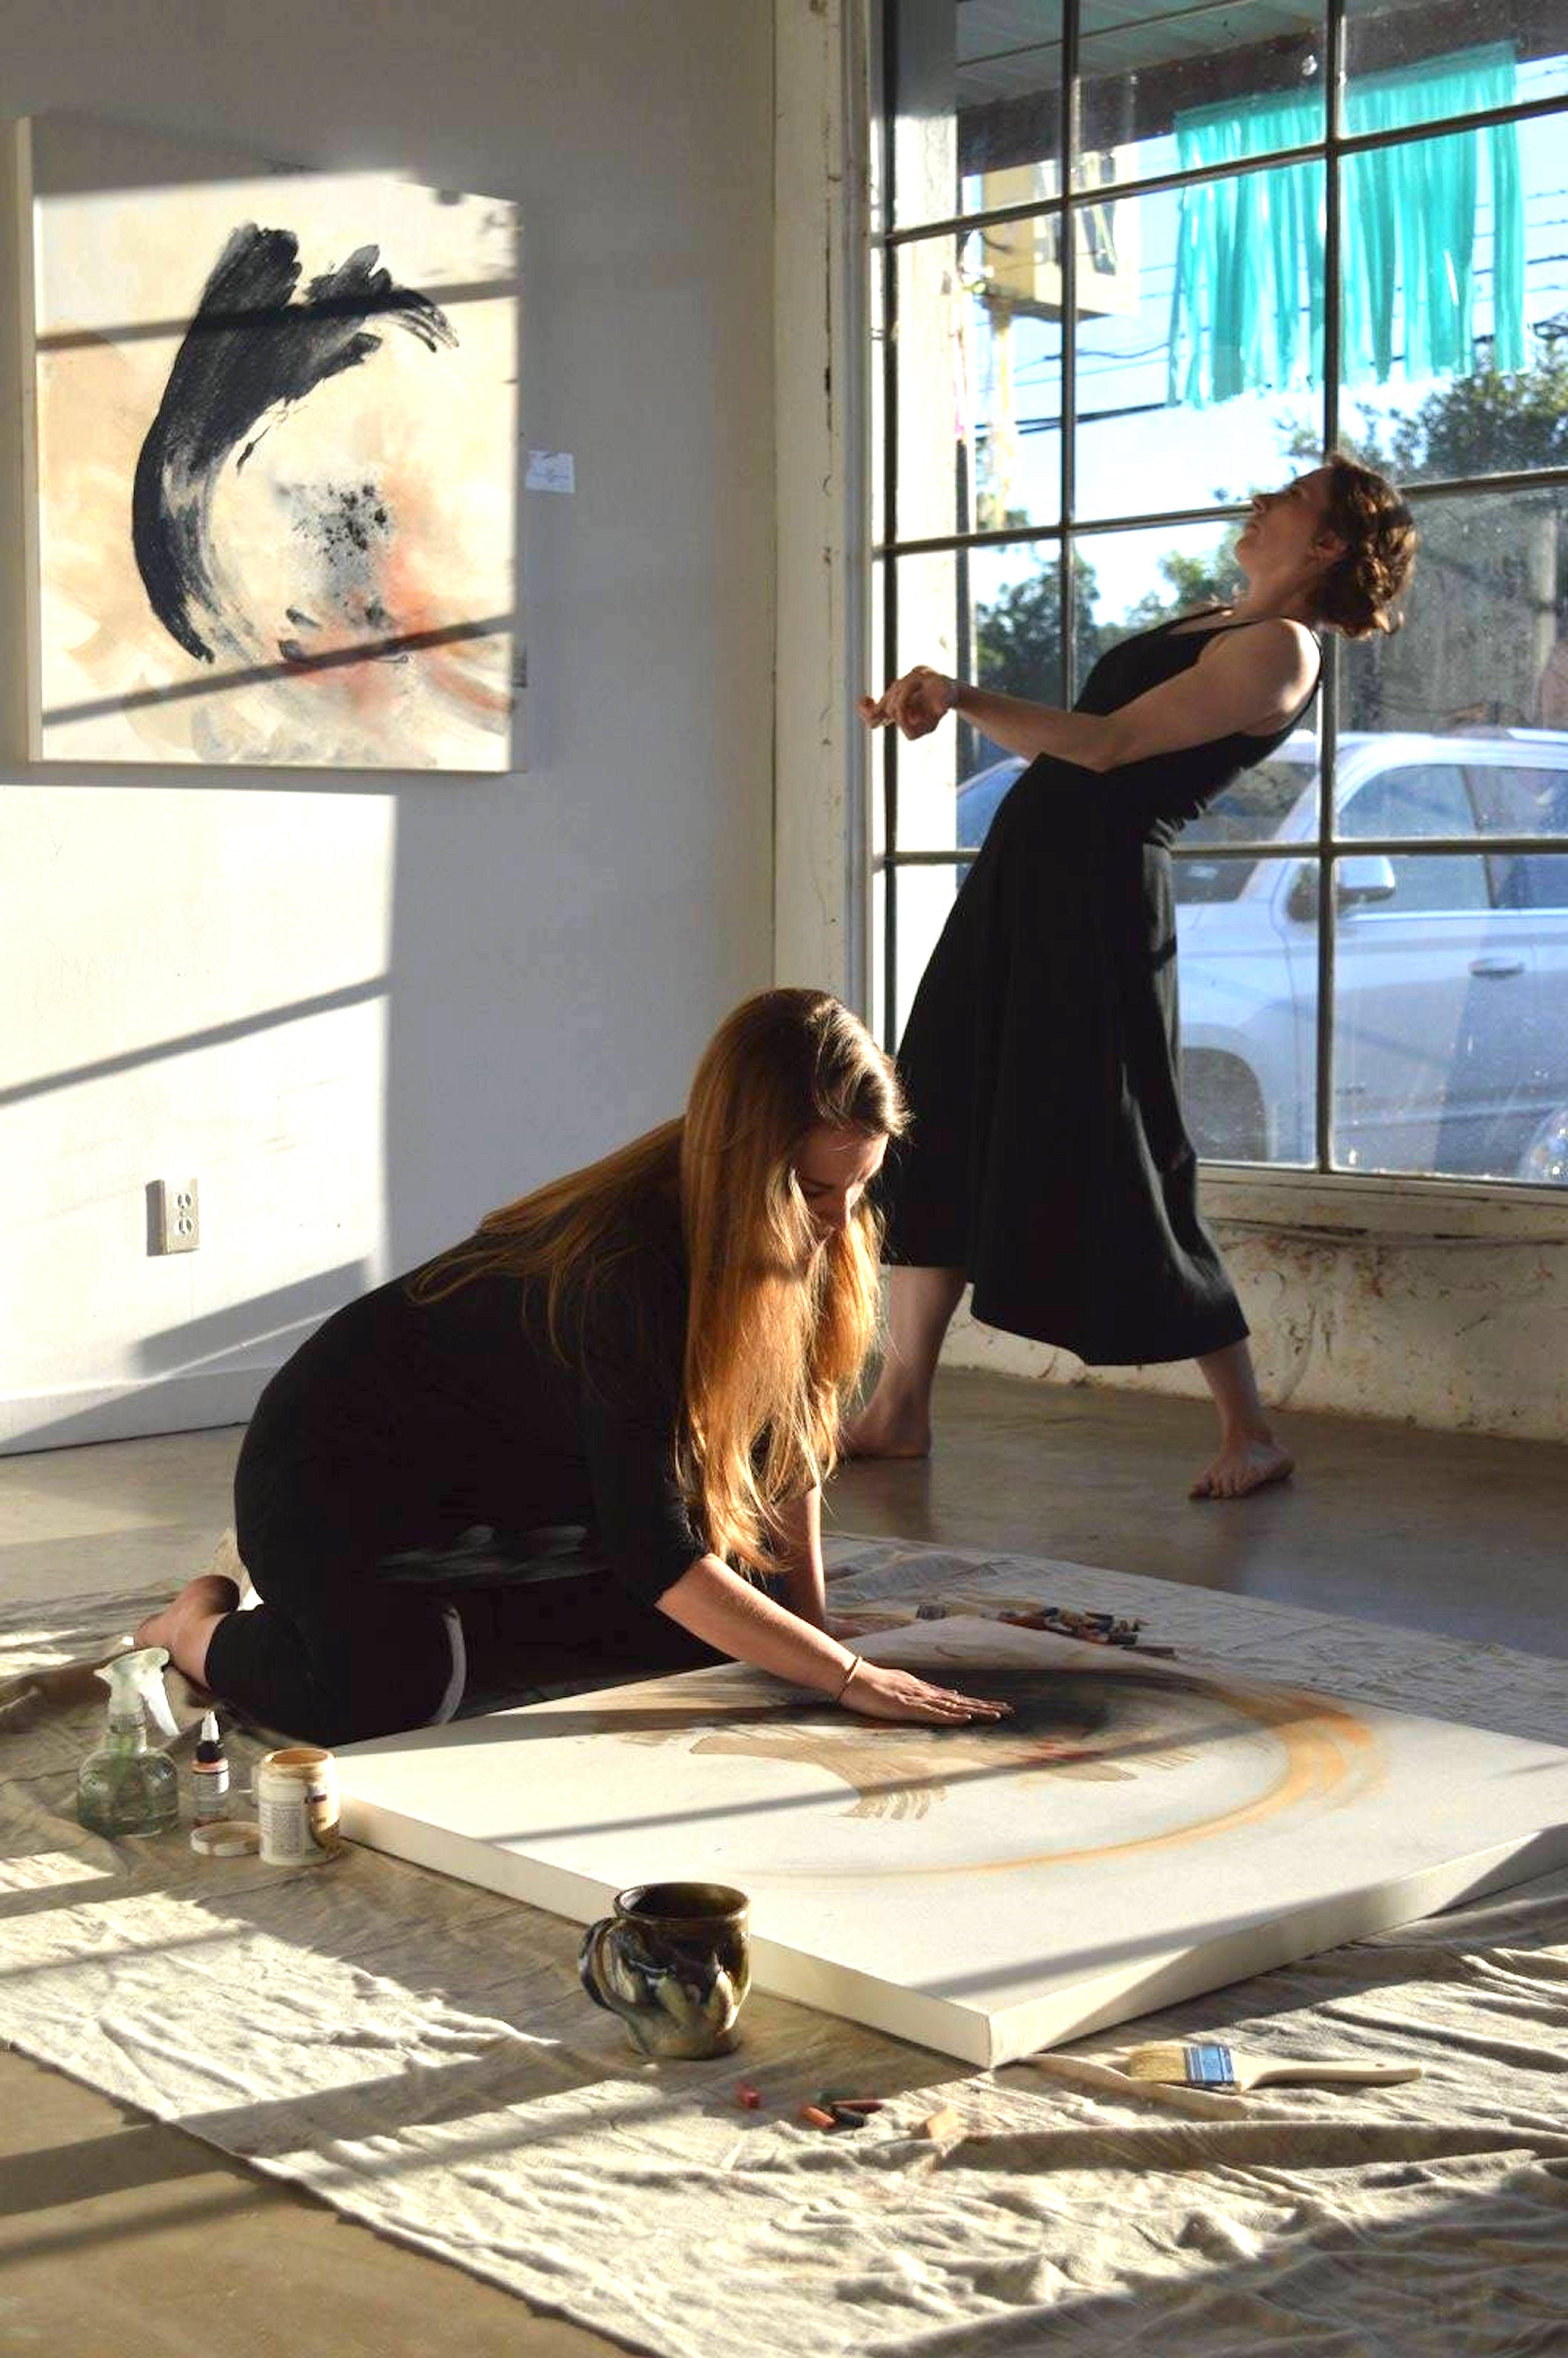 painting:dance performance